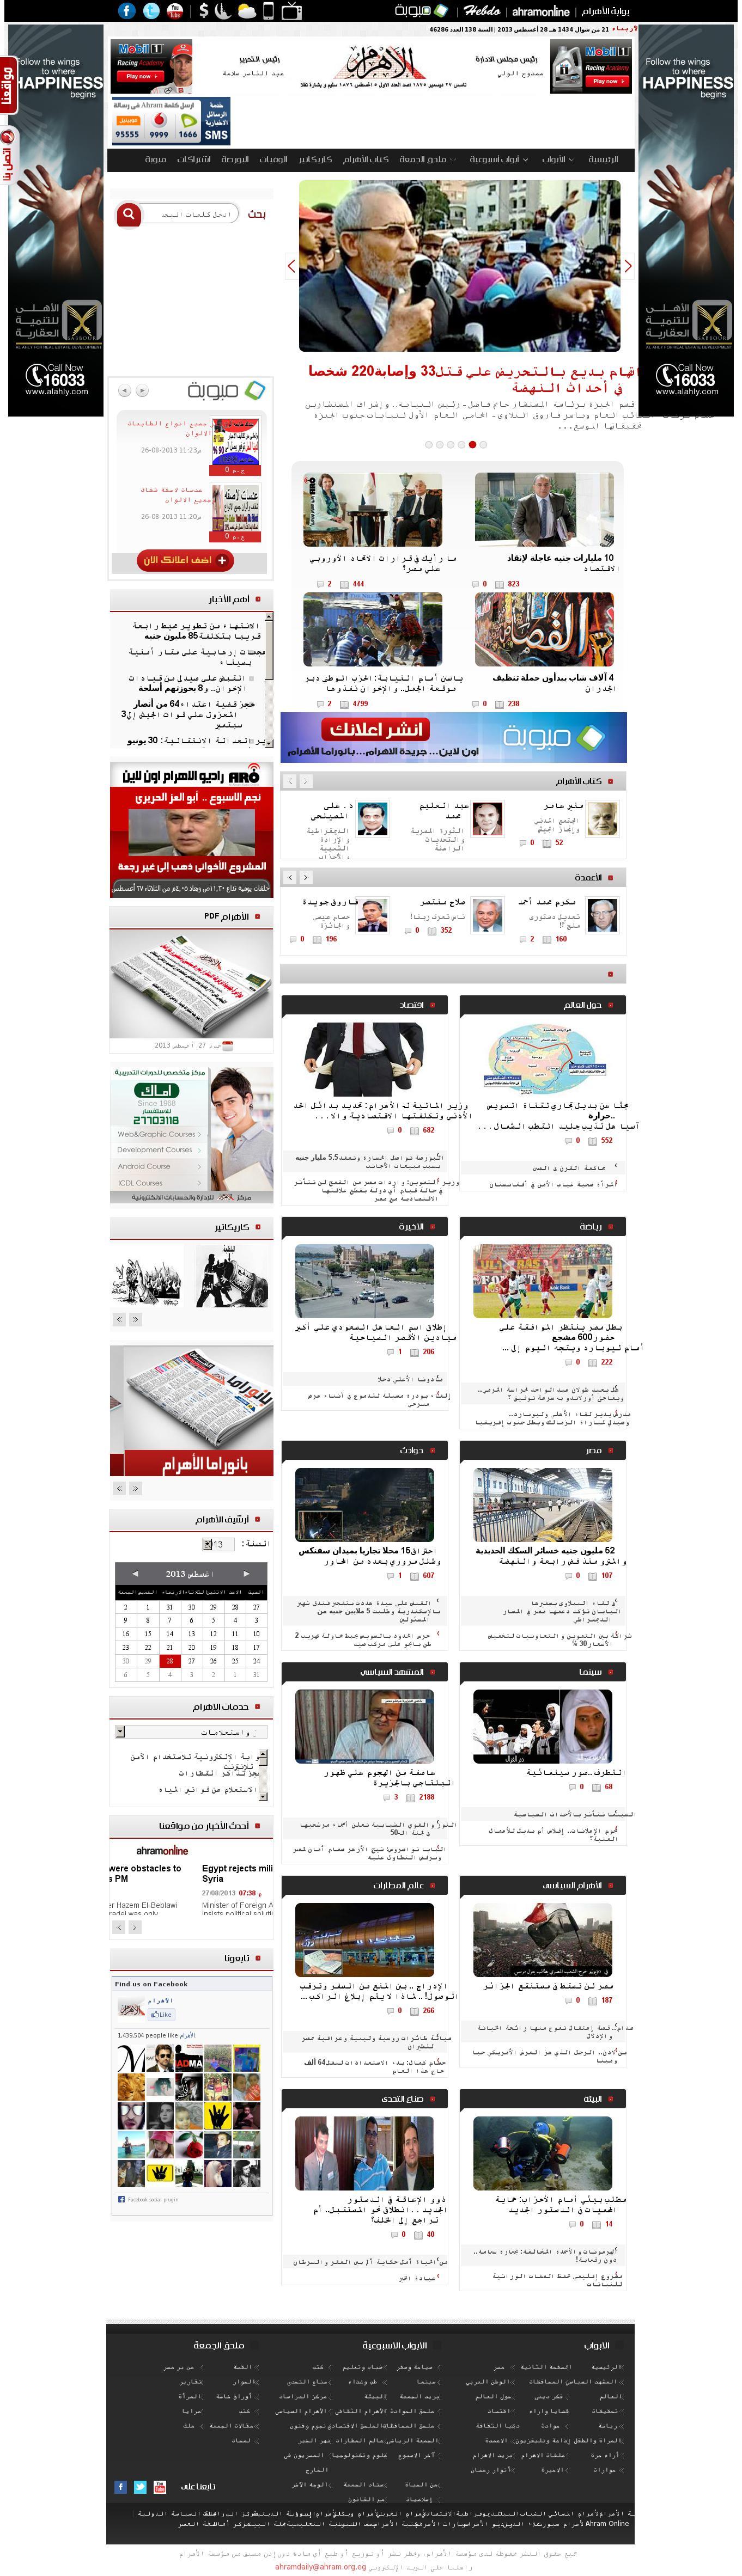 Al-Ahram at Wednesday Aug. 28, 2013, midnight UTC